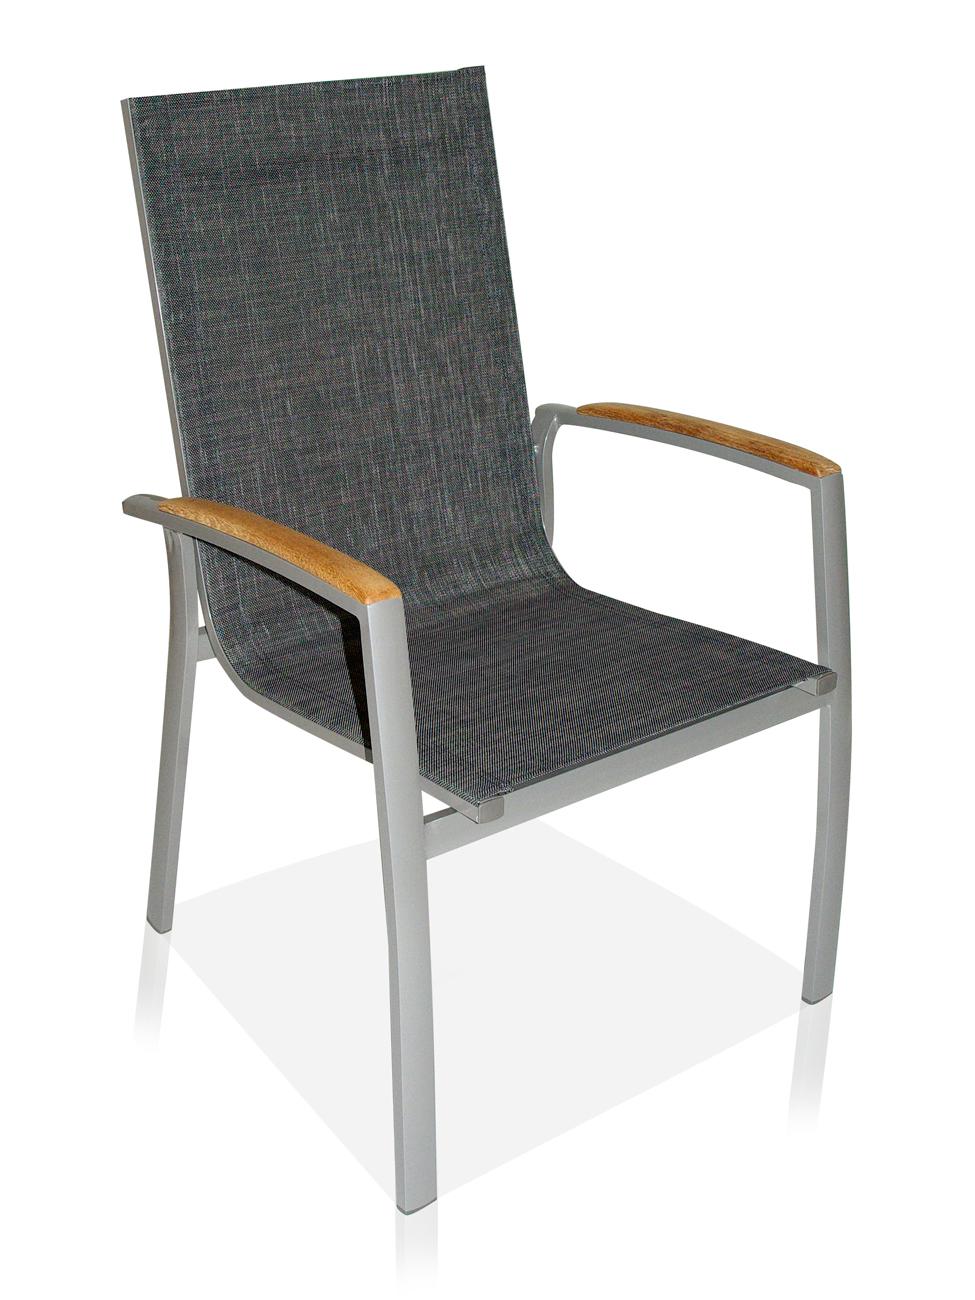 gartenmoebel gartenstuehle gartenstuehle aus metall b2b. Black Bedroom Furniture Sets. Home Design Ideas